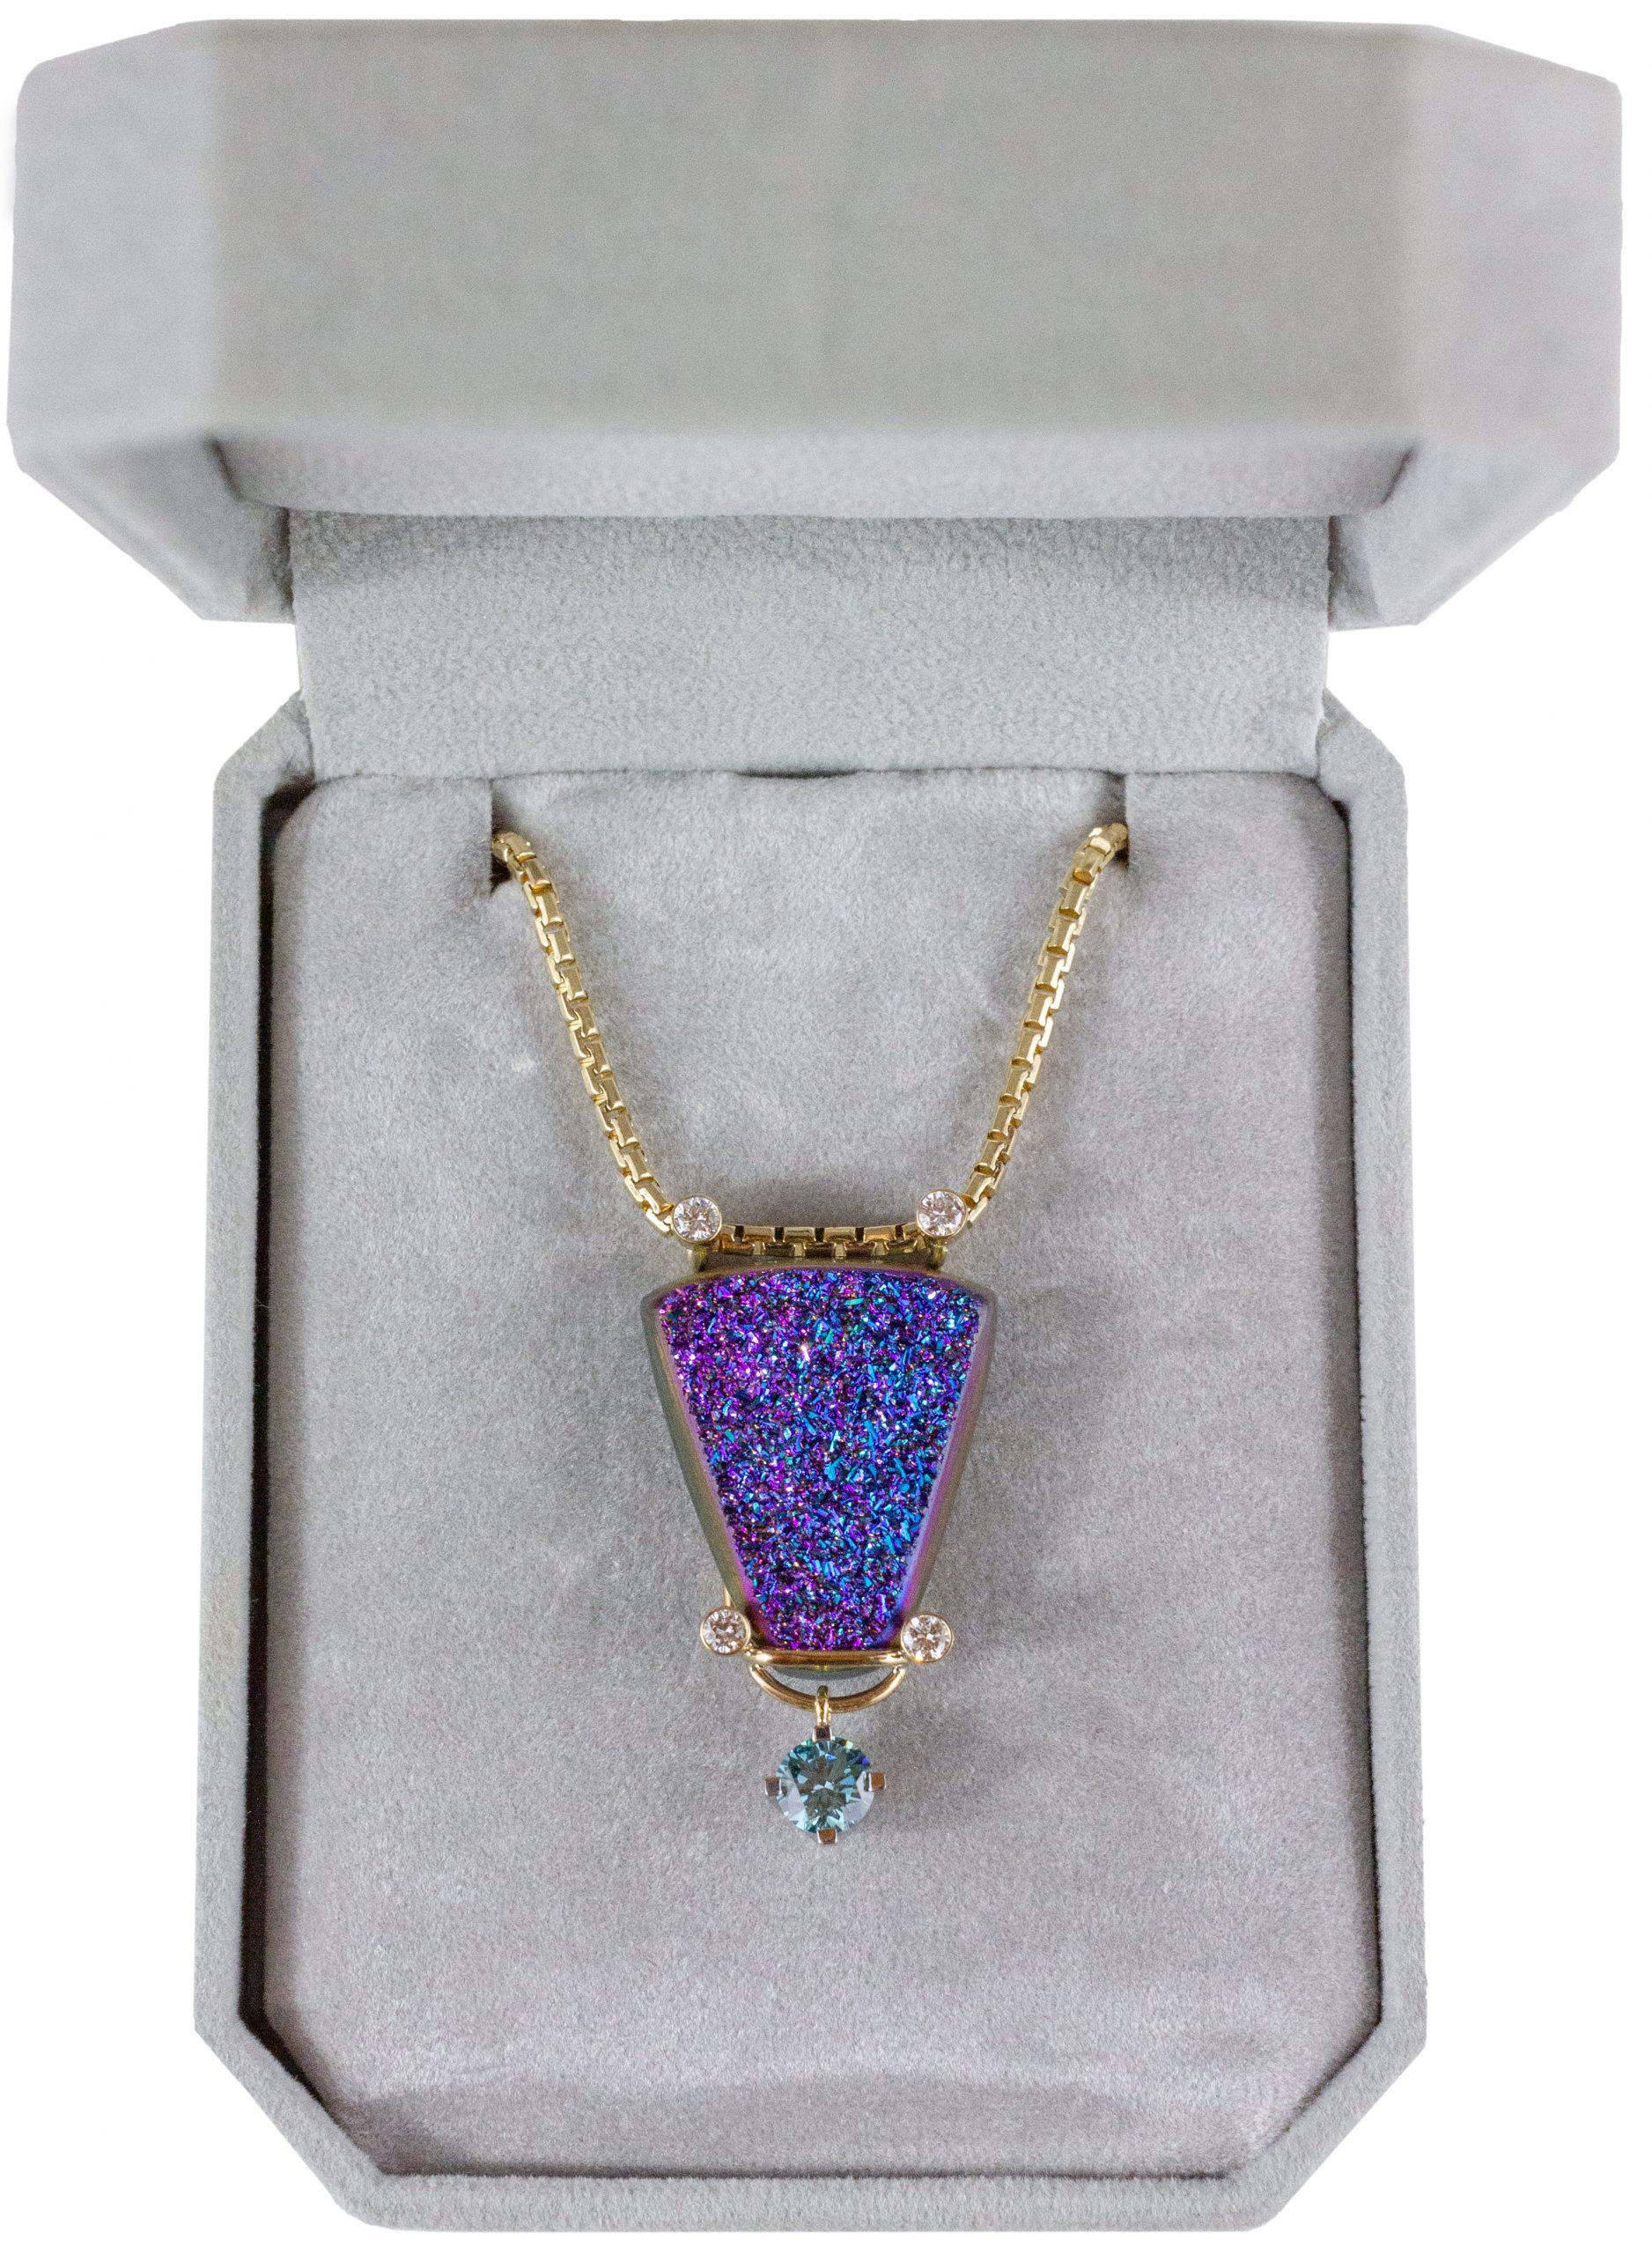 Blue triangular pendant with light blue stone.